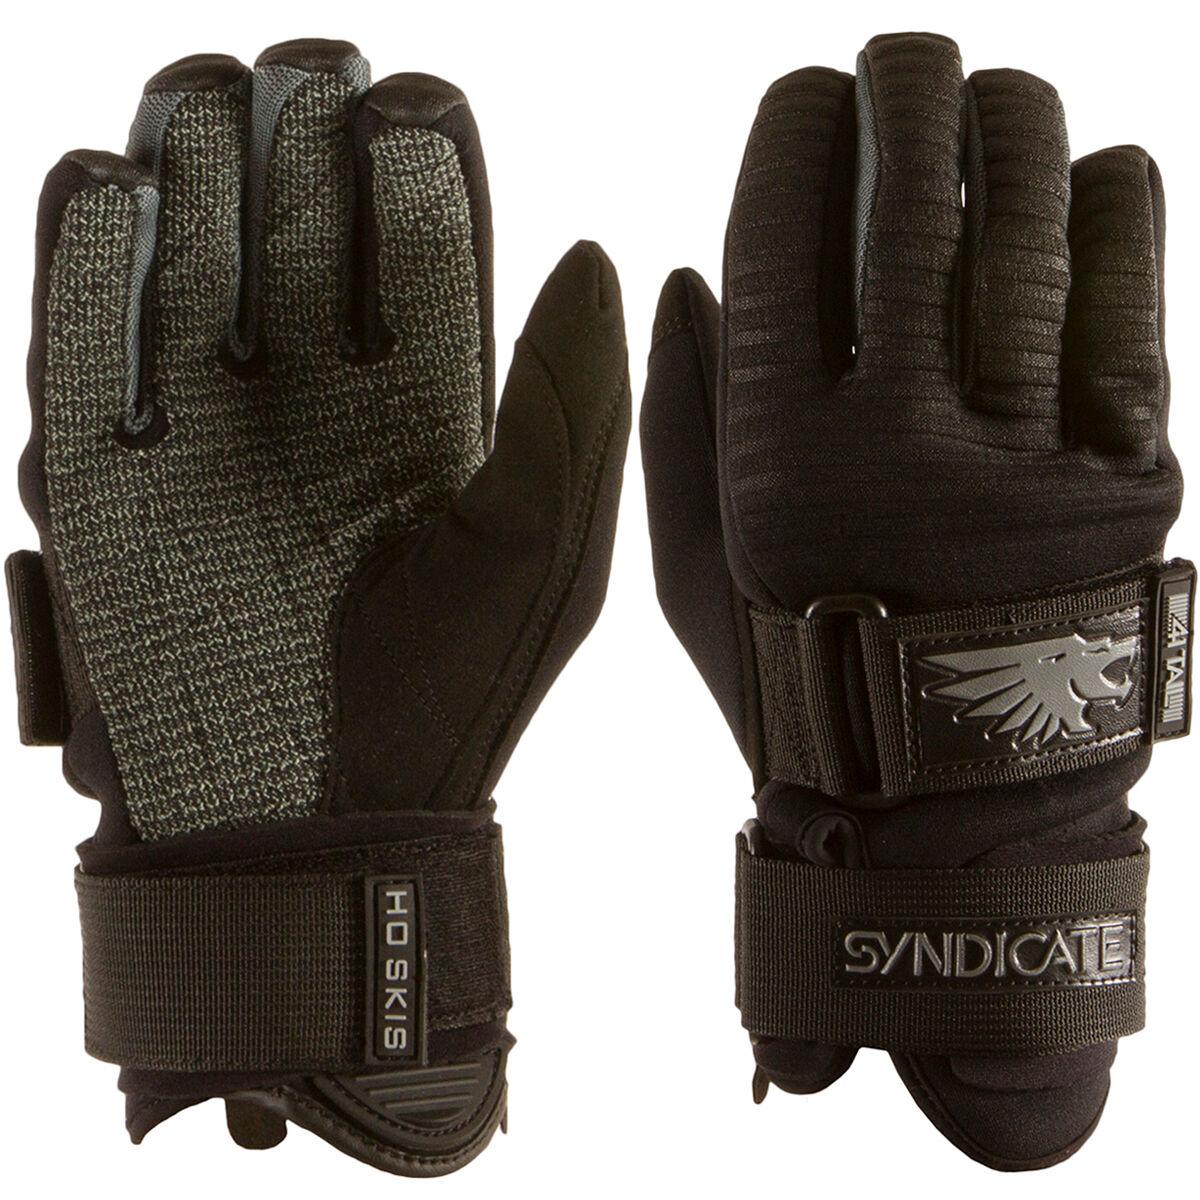 HO Sports HO 41 Tail Waterski Glove 2019